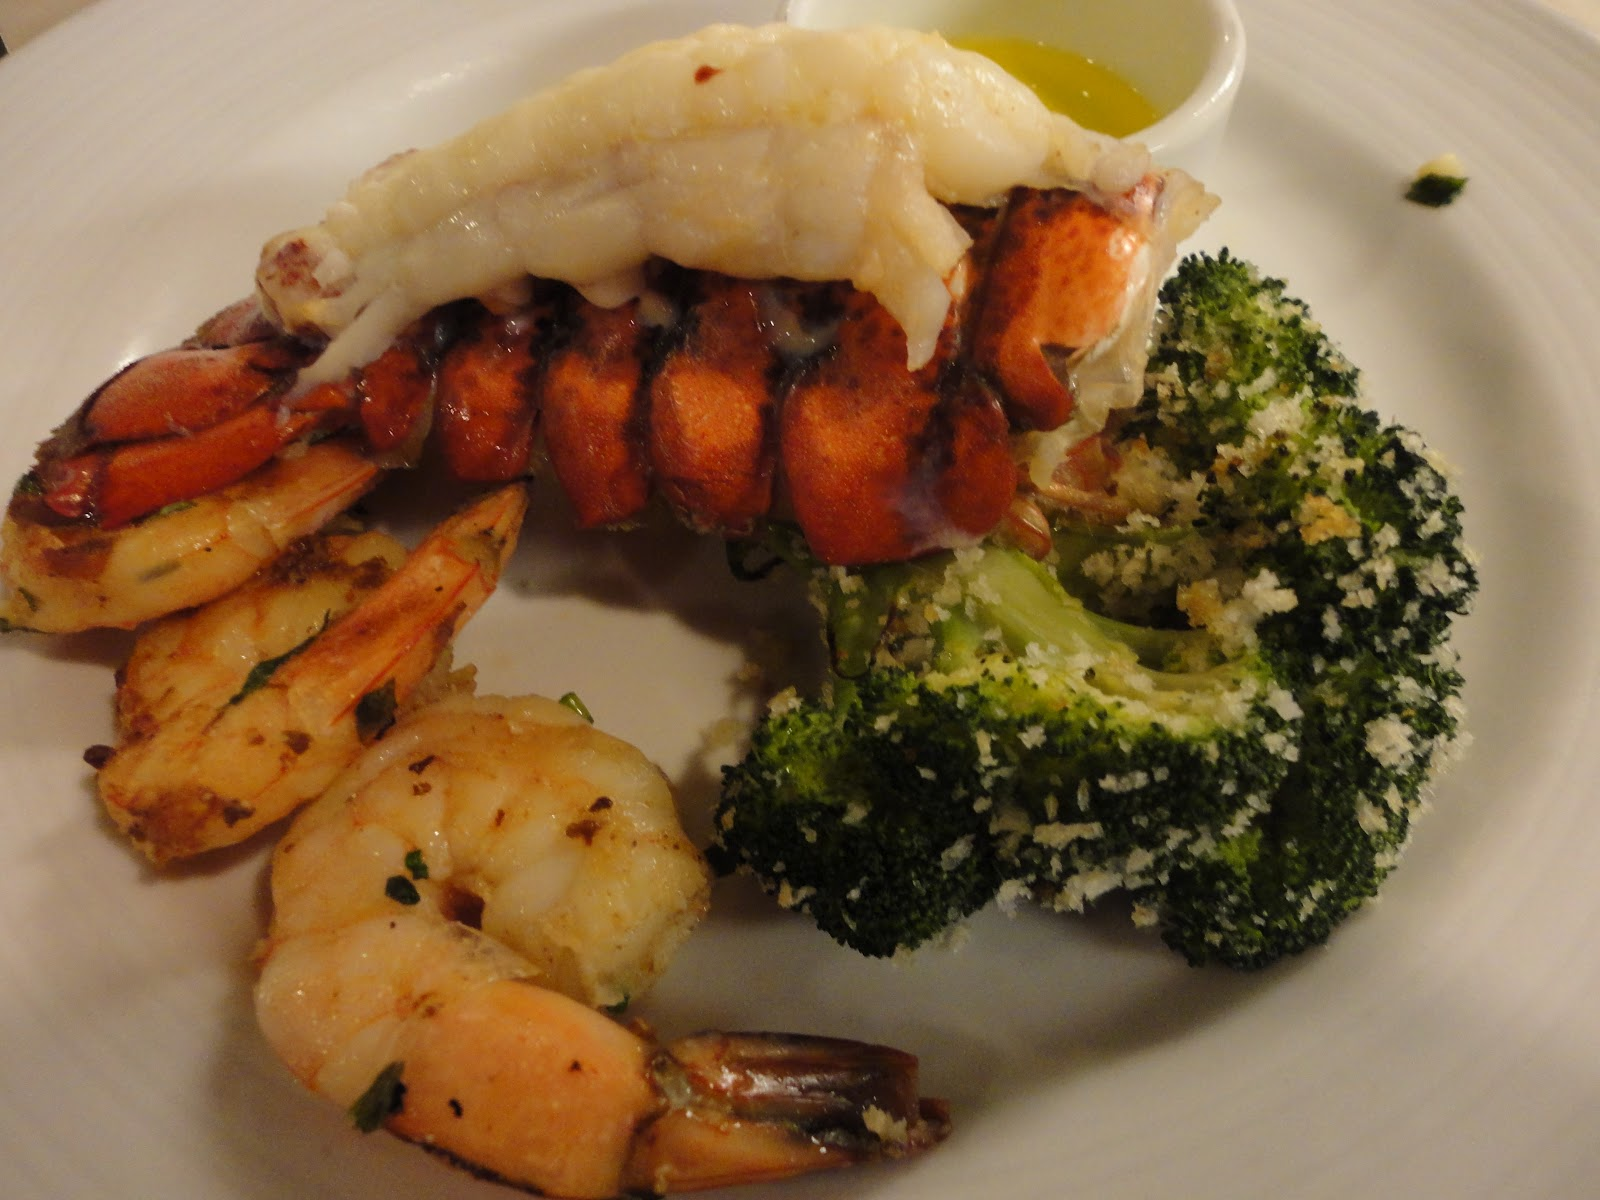 25 Facebook Carnival Bahamas Cruise Food Youmailr Com